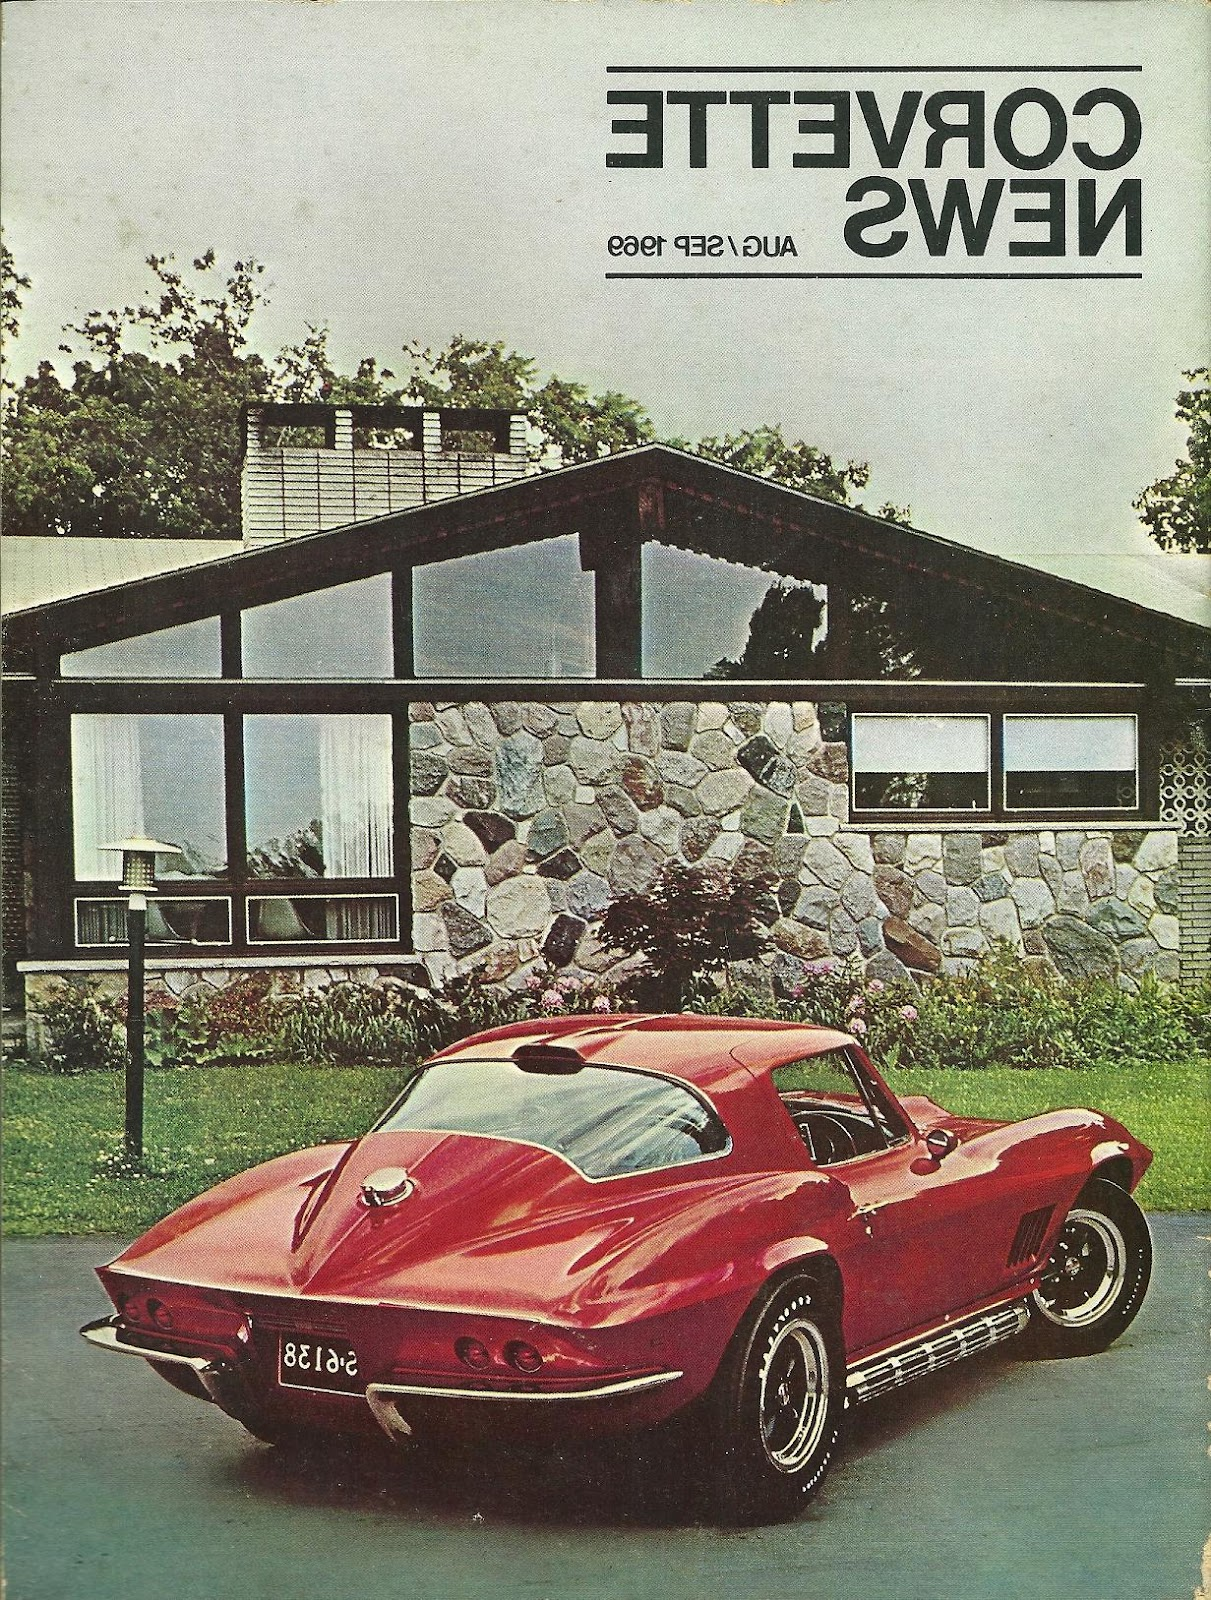 1965 Chevelle brochure.  23.95